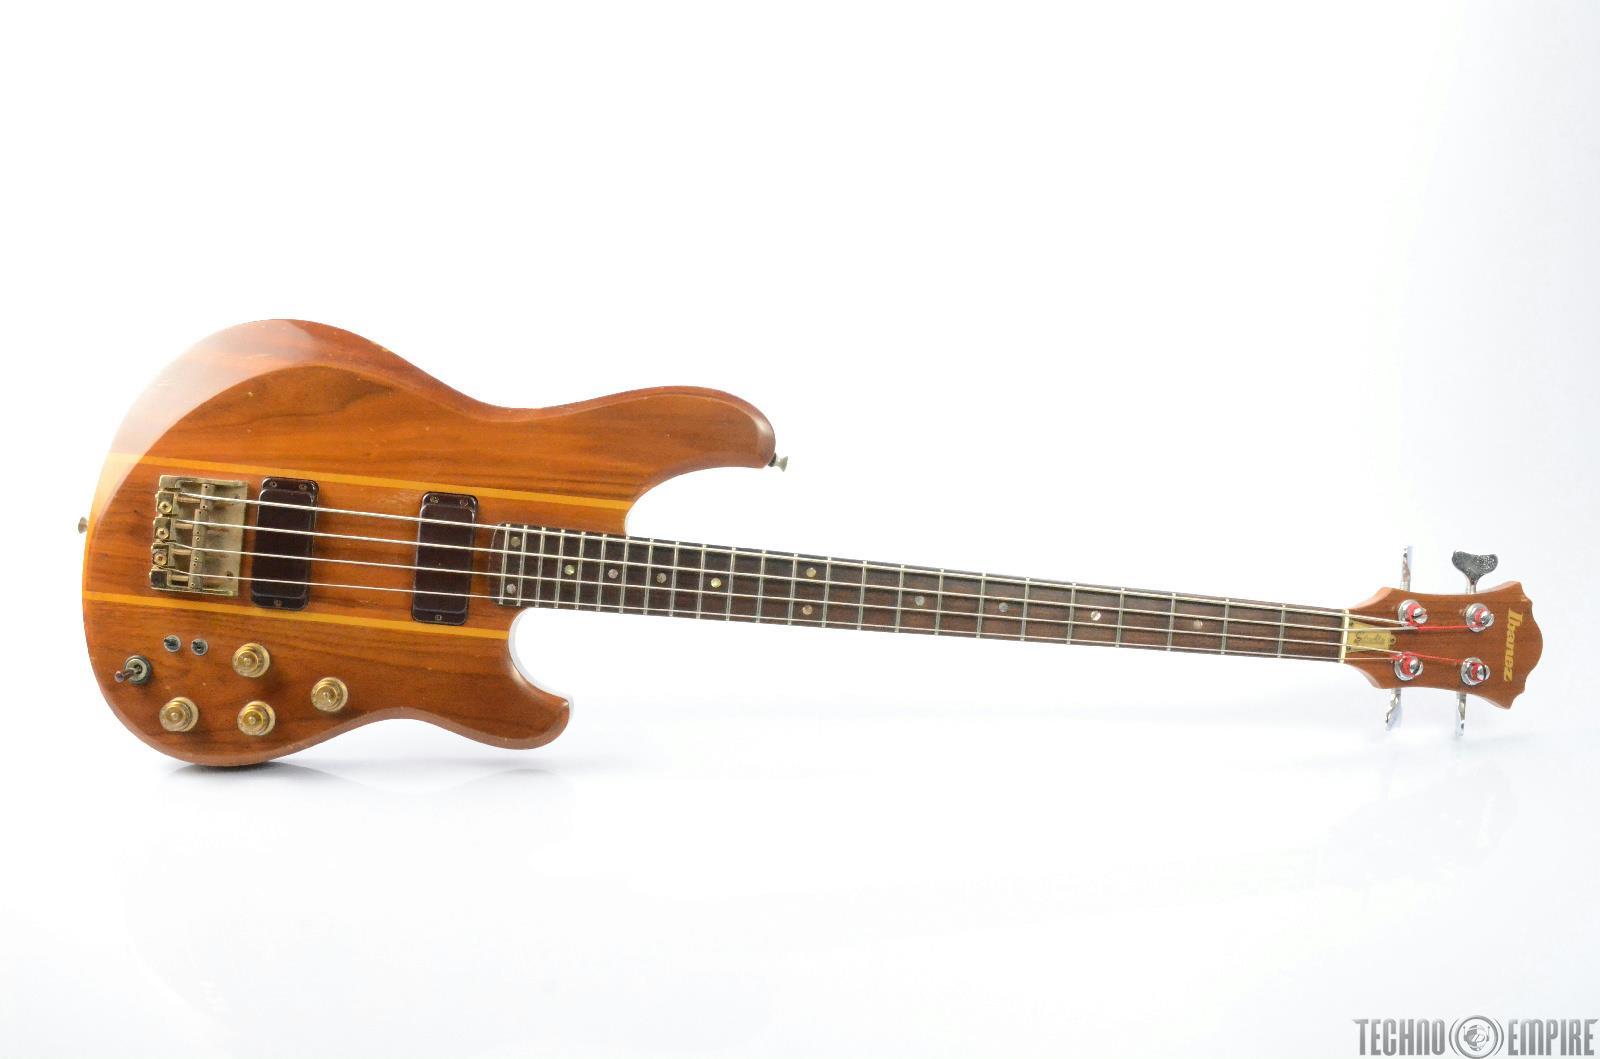 1980 IBANEZ ST-824 Studio Electric Bass Guitar w/ original Case #26334